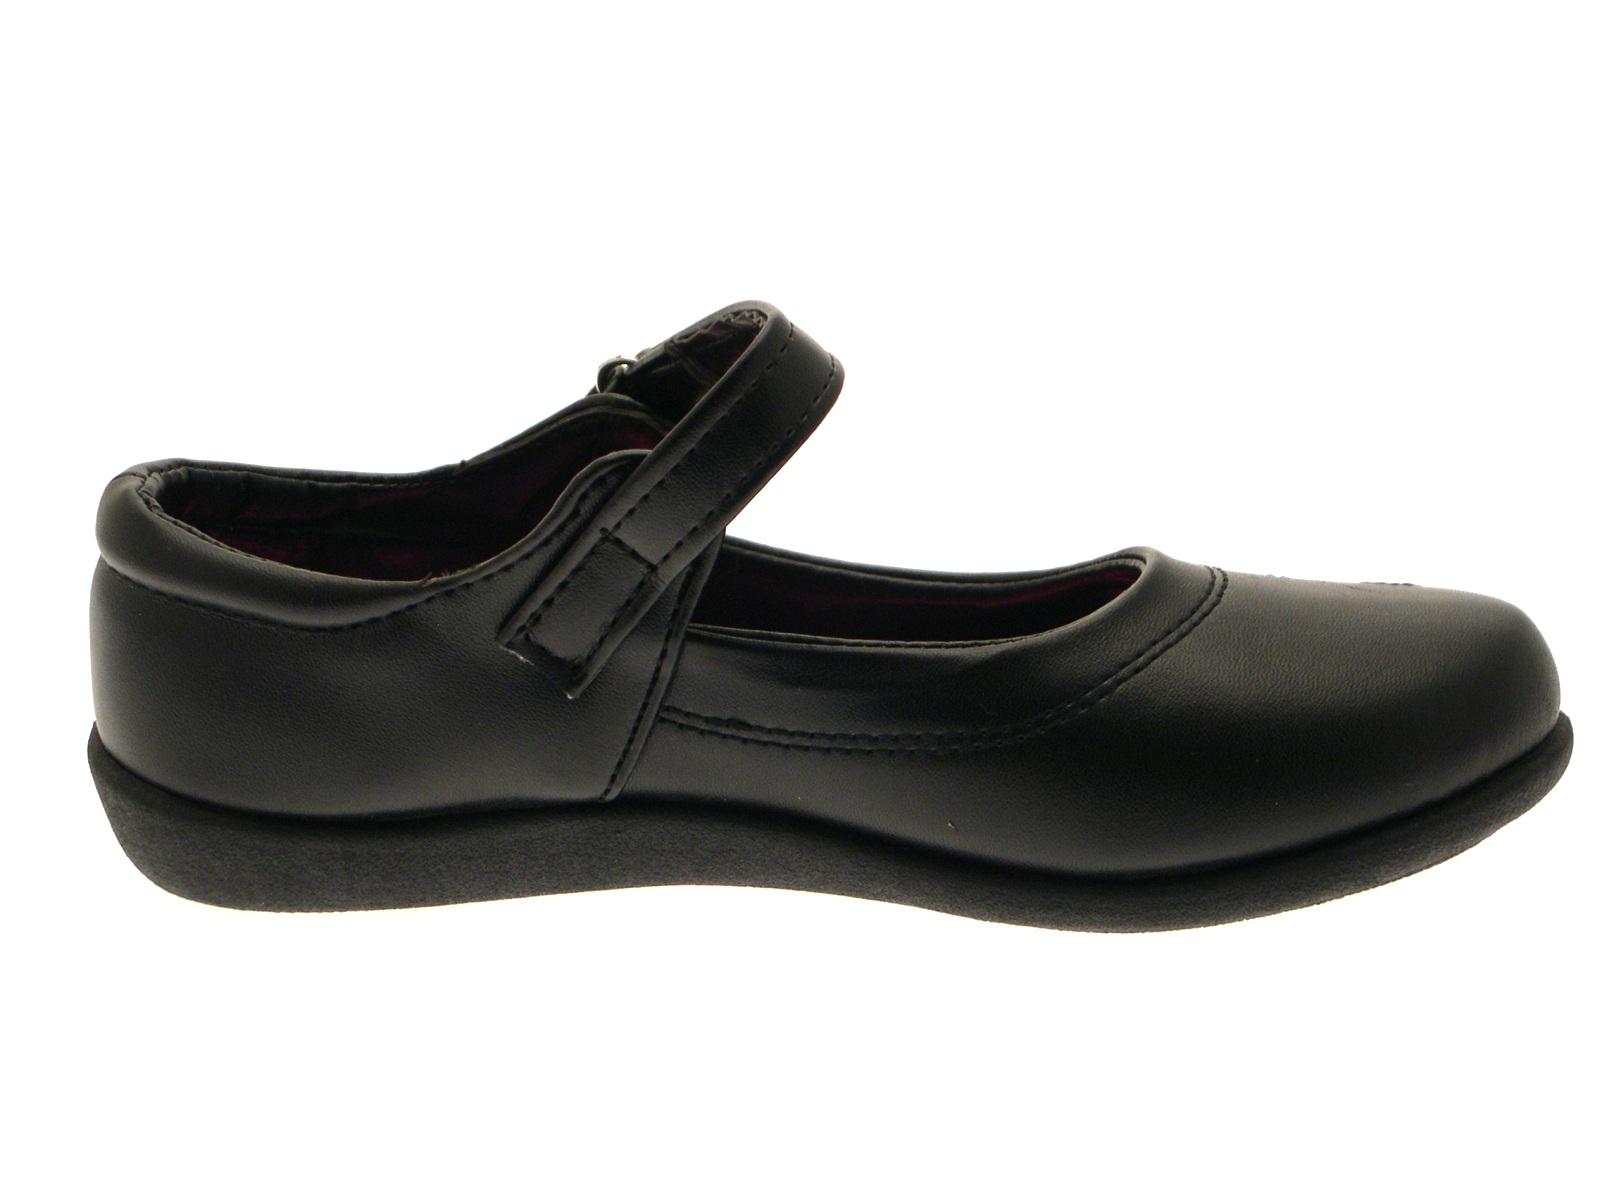 Kids Girls Flat Black School Shoes Faux Leather Mary Jane ...